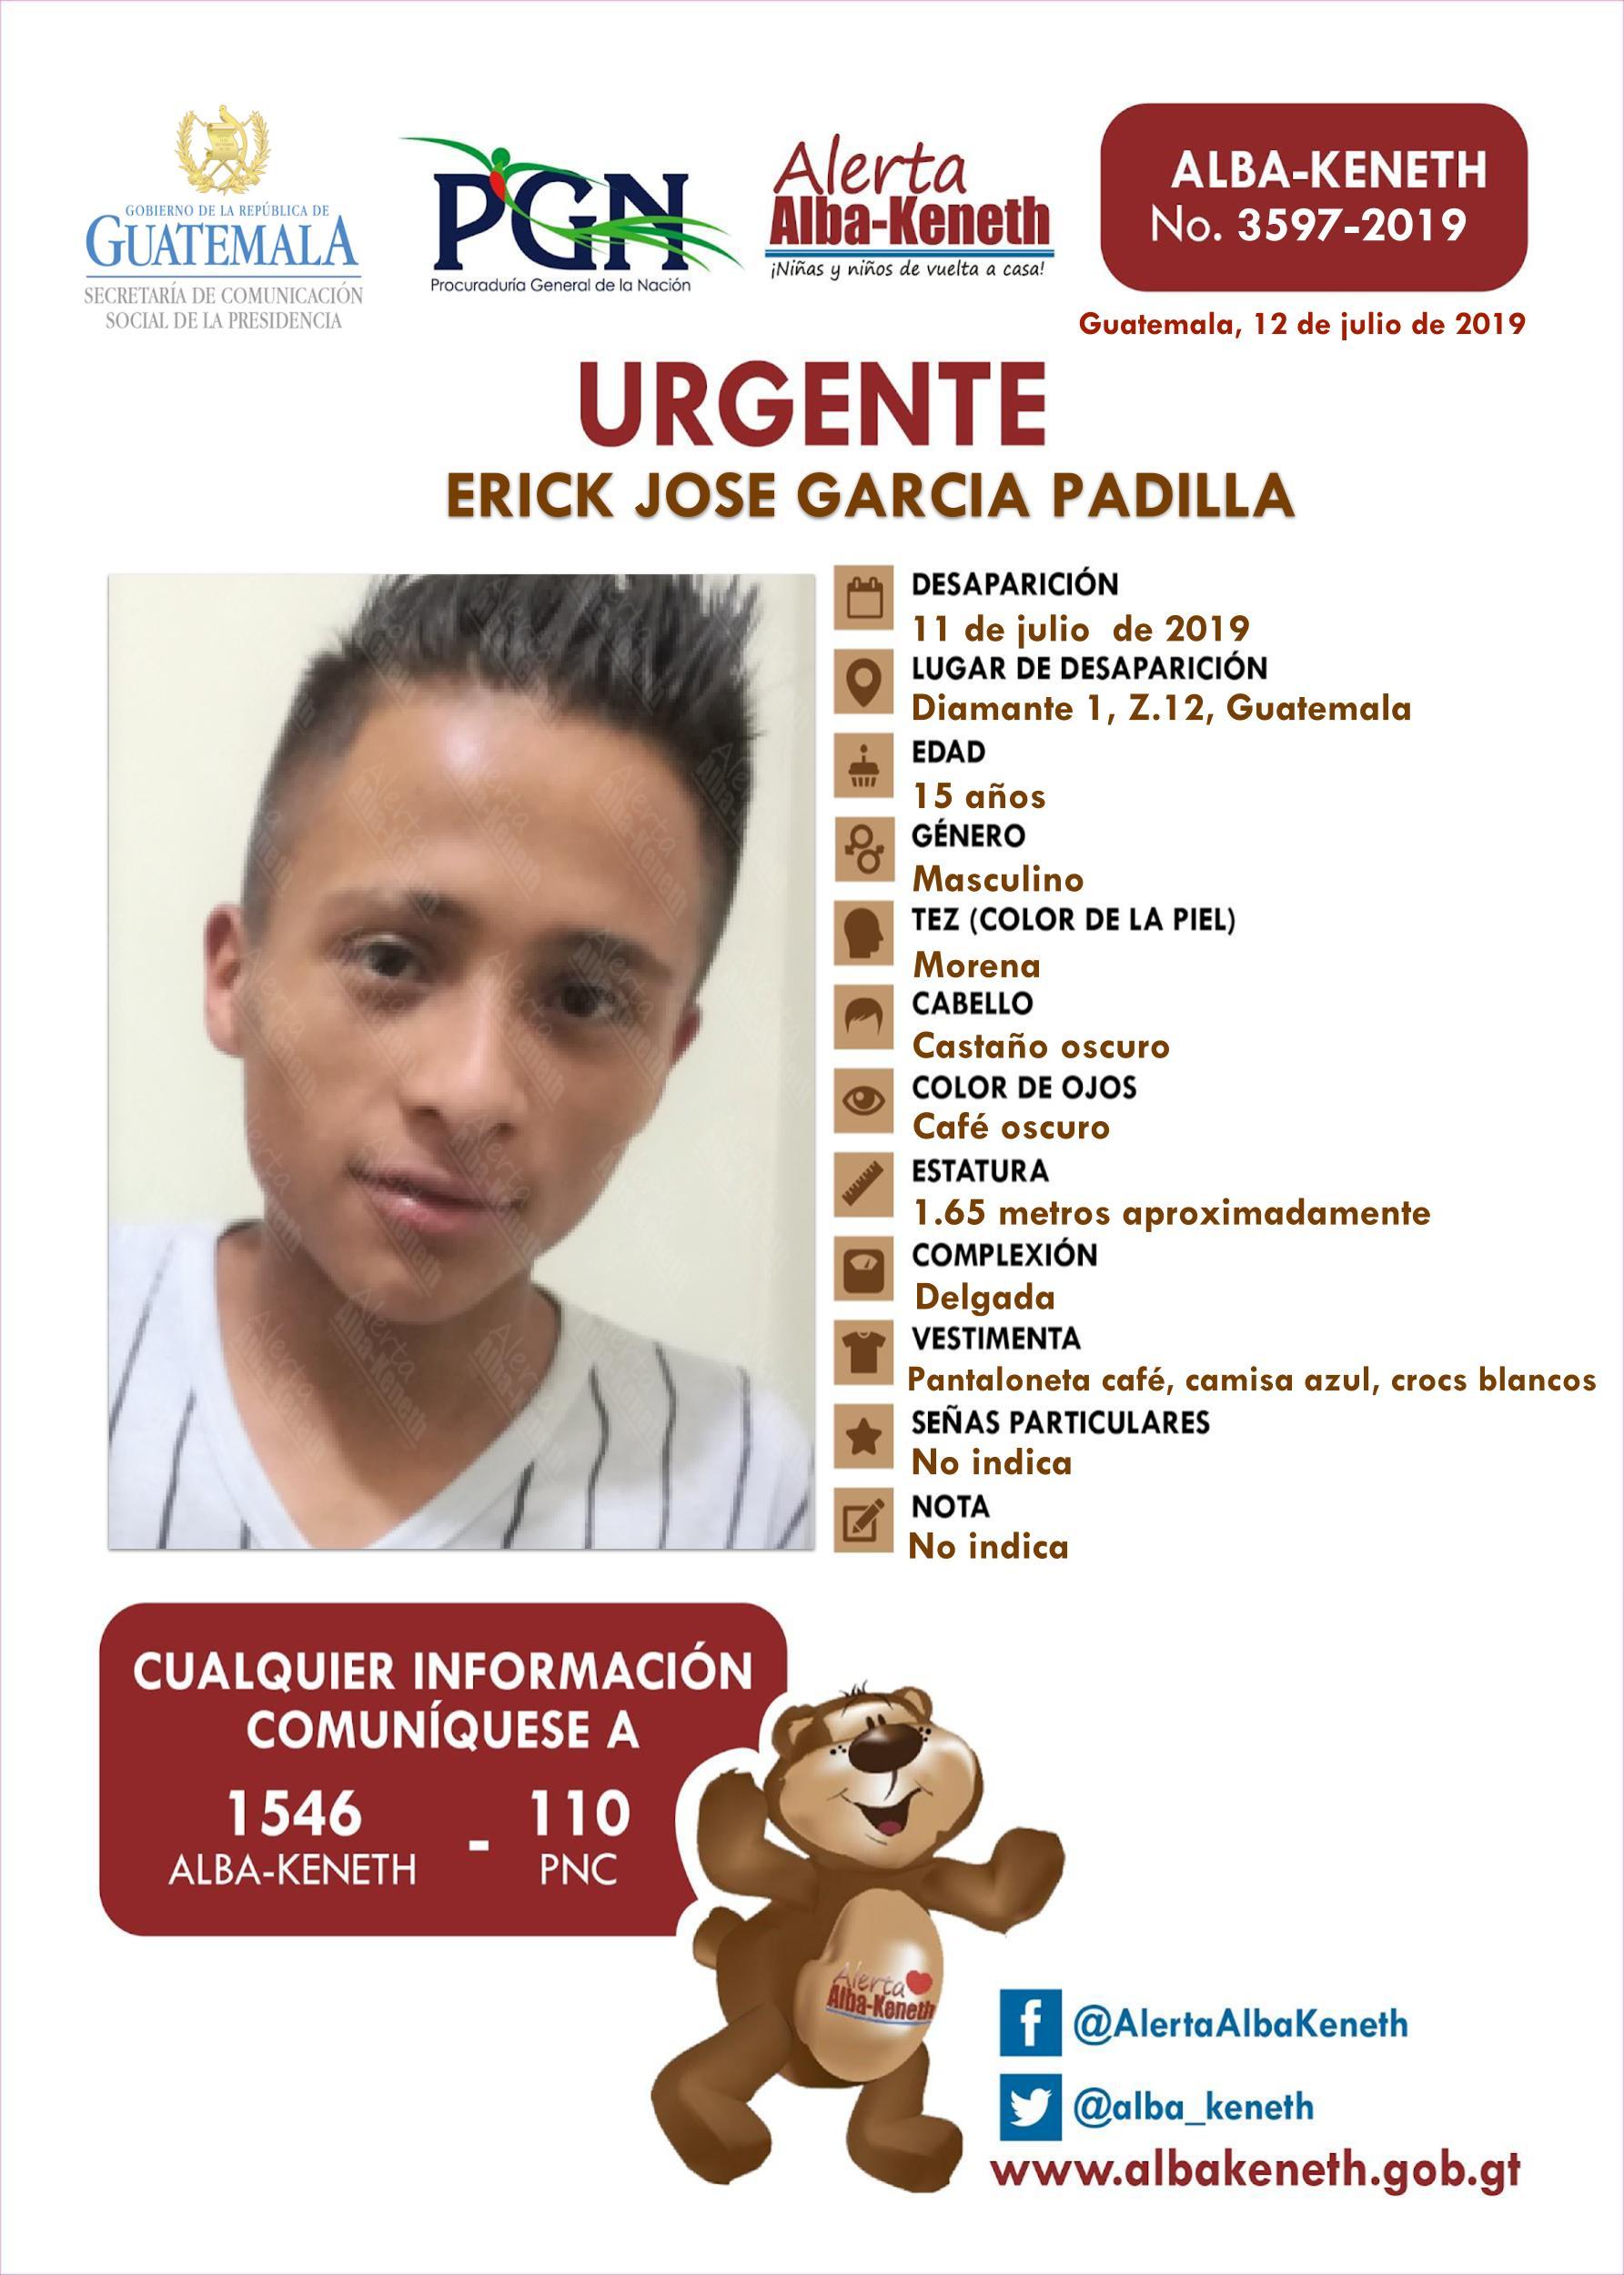 Erick Jose Garcia Padilla